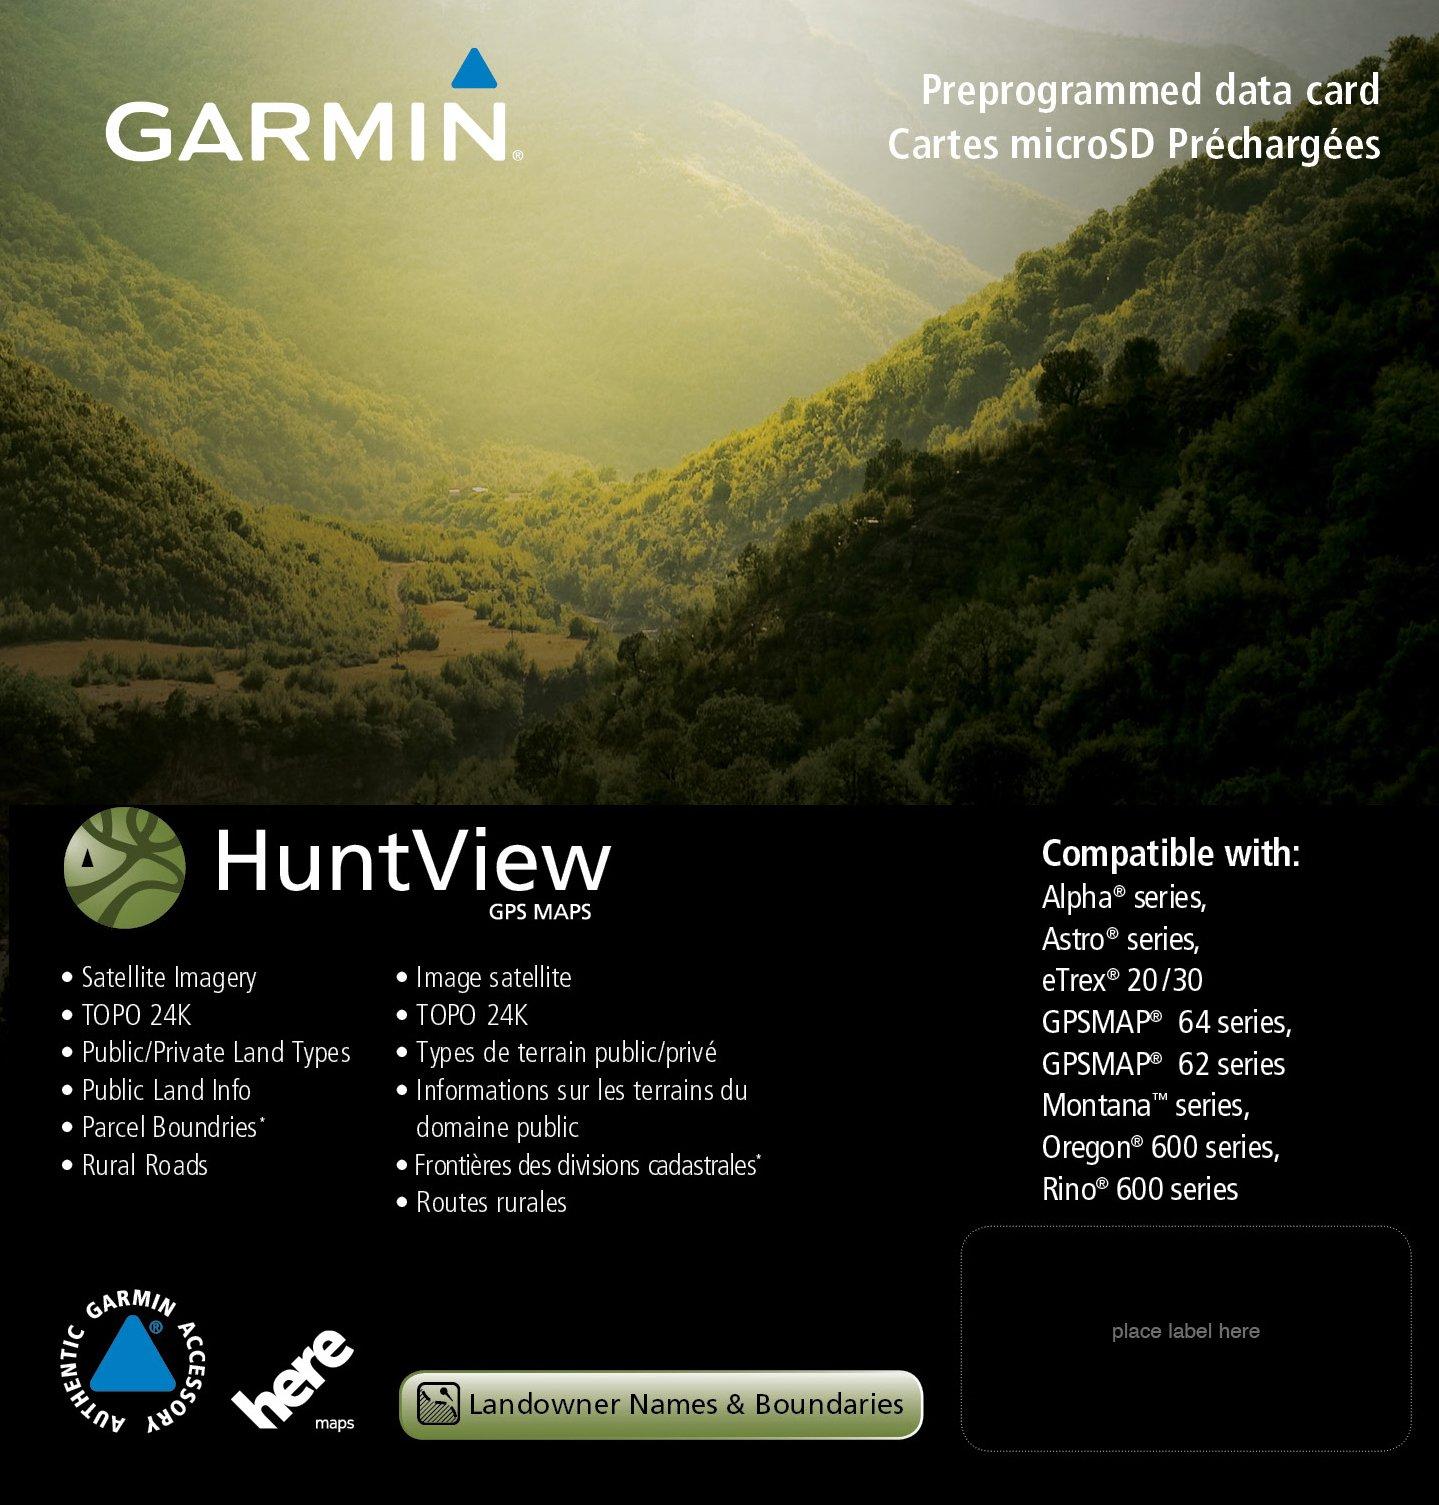 Garmin 010-12645-01 Huntview Map Card - West Virginia